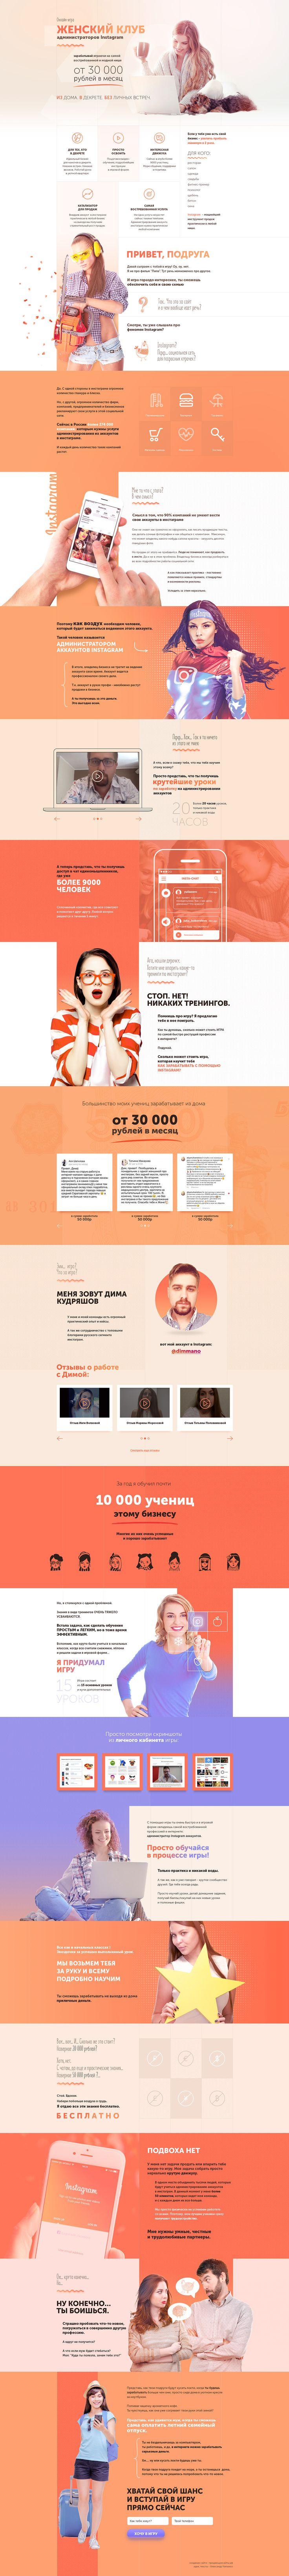 Ознакомьтесь с моим проектом @Behance: «Landing page» https://www.behance.net/gallery/59478369/Landing-page